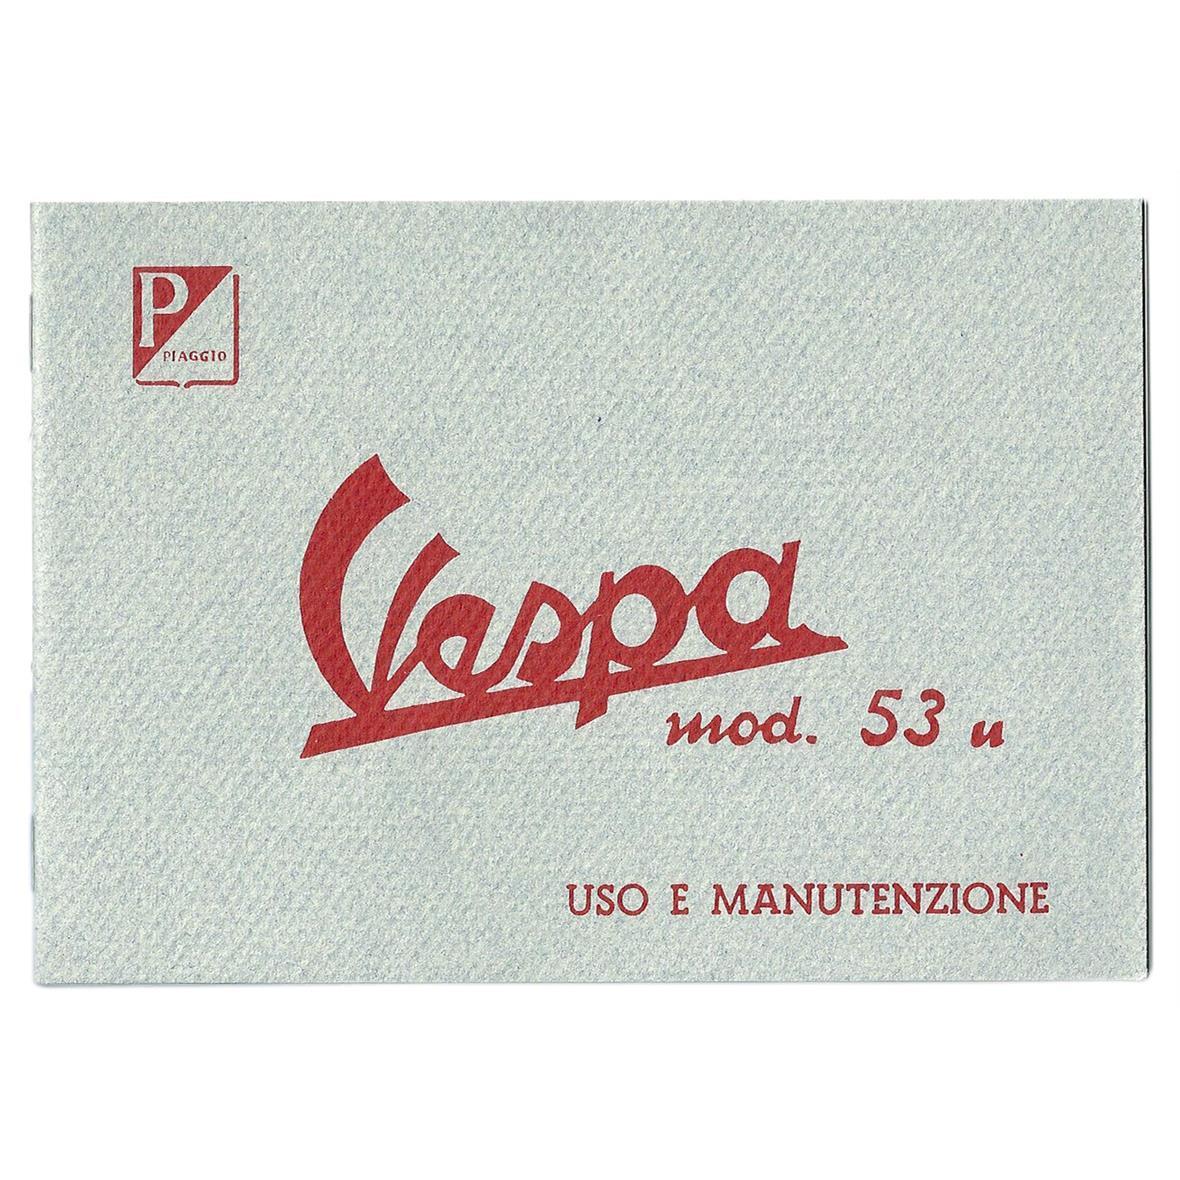 Product Image for 'Instruction Manual PIAGGIO Vespa 125 1953Title'